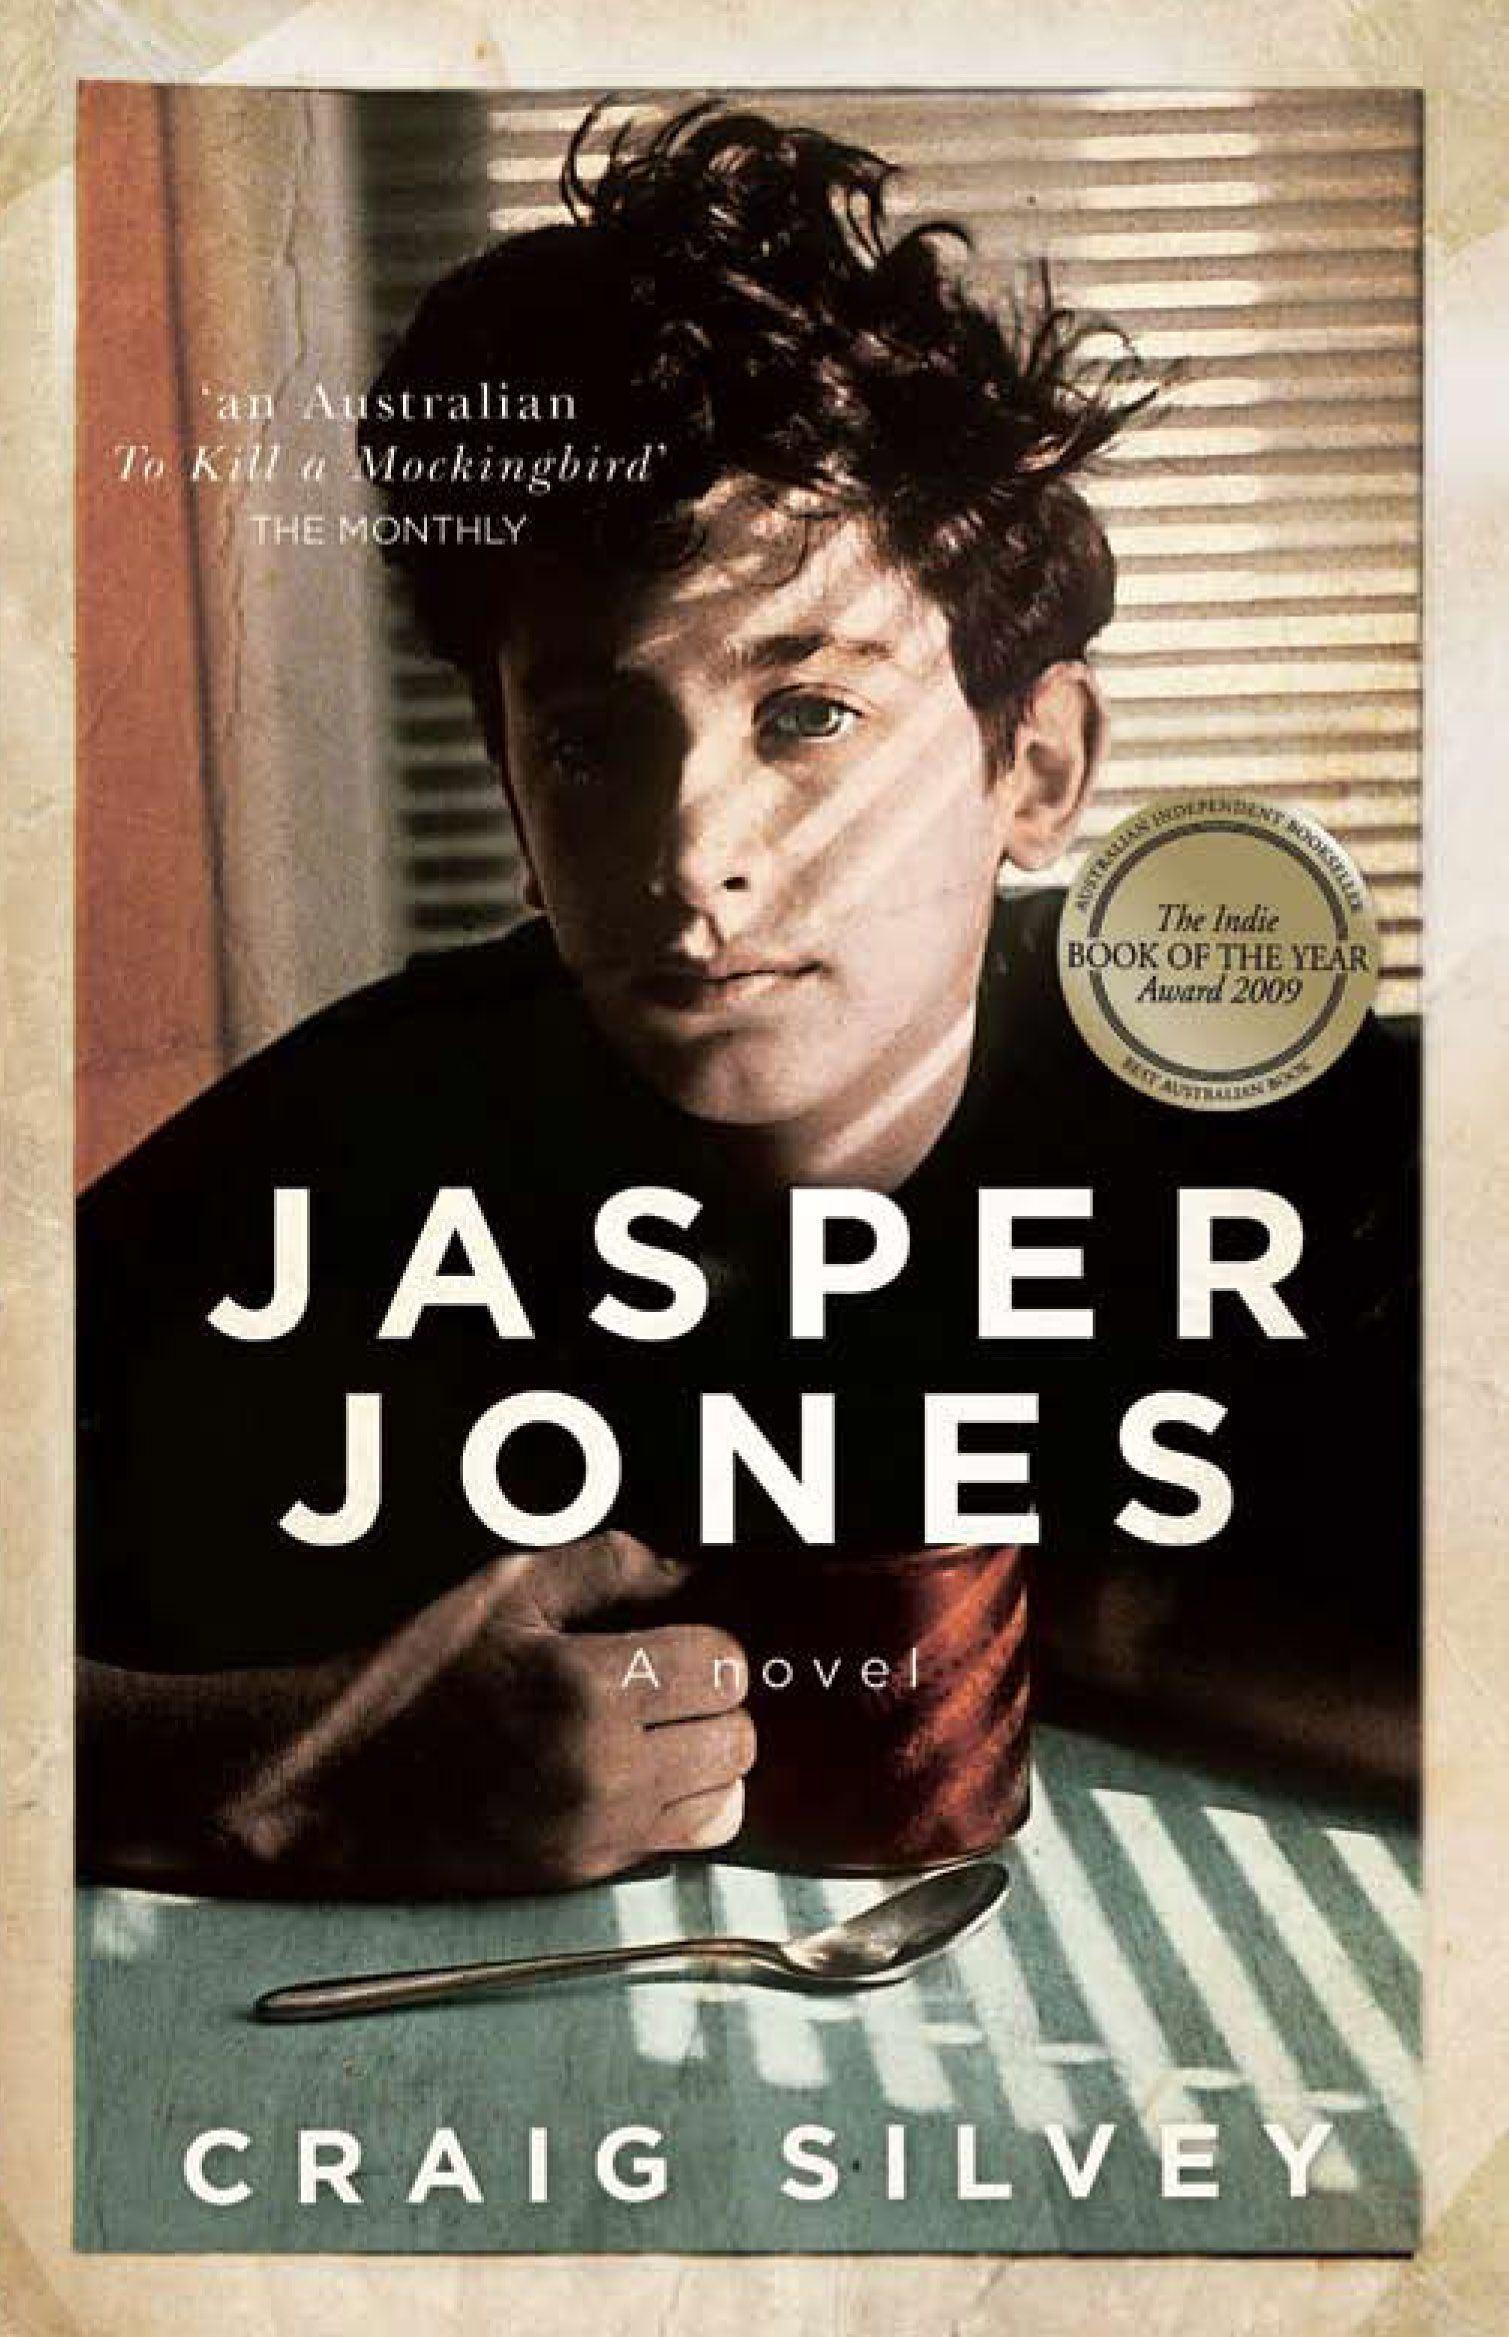 Jasper Jones by Craig Silvey (Audiobook)  Amazon  |  Audiobook  |  Goodreads